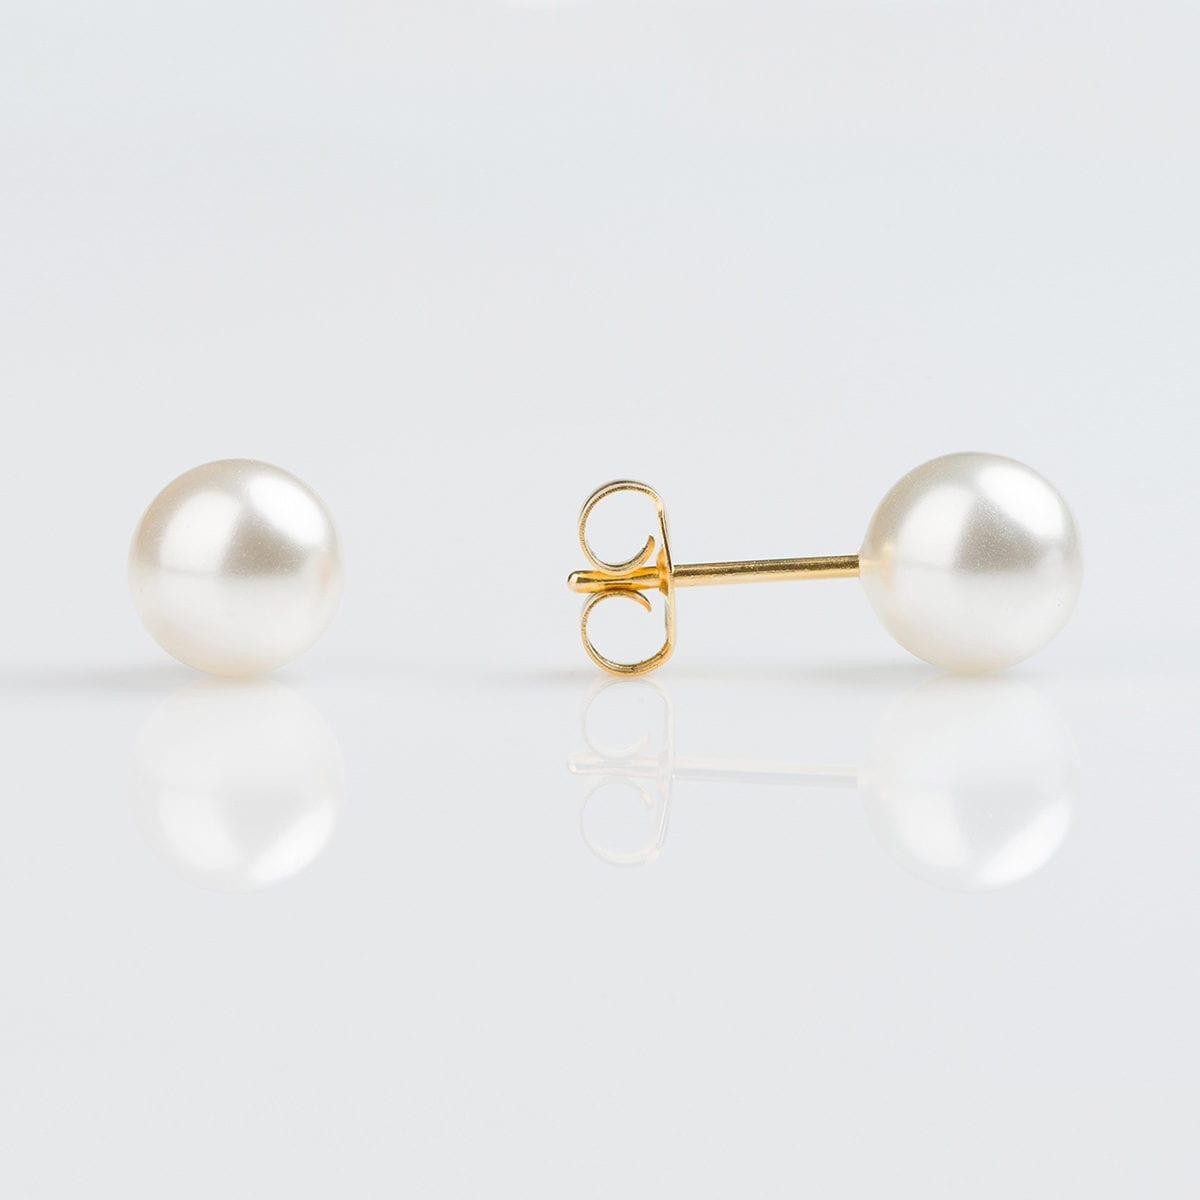 studex-sensitive-6mm-pearl